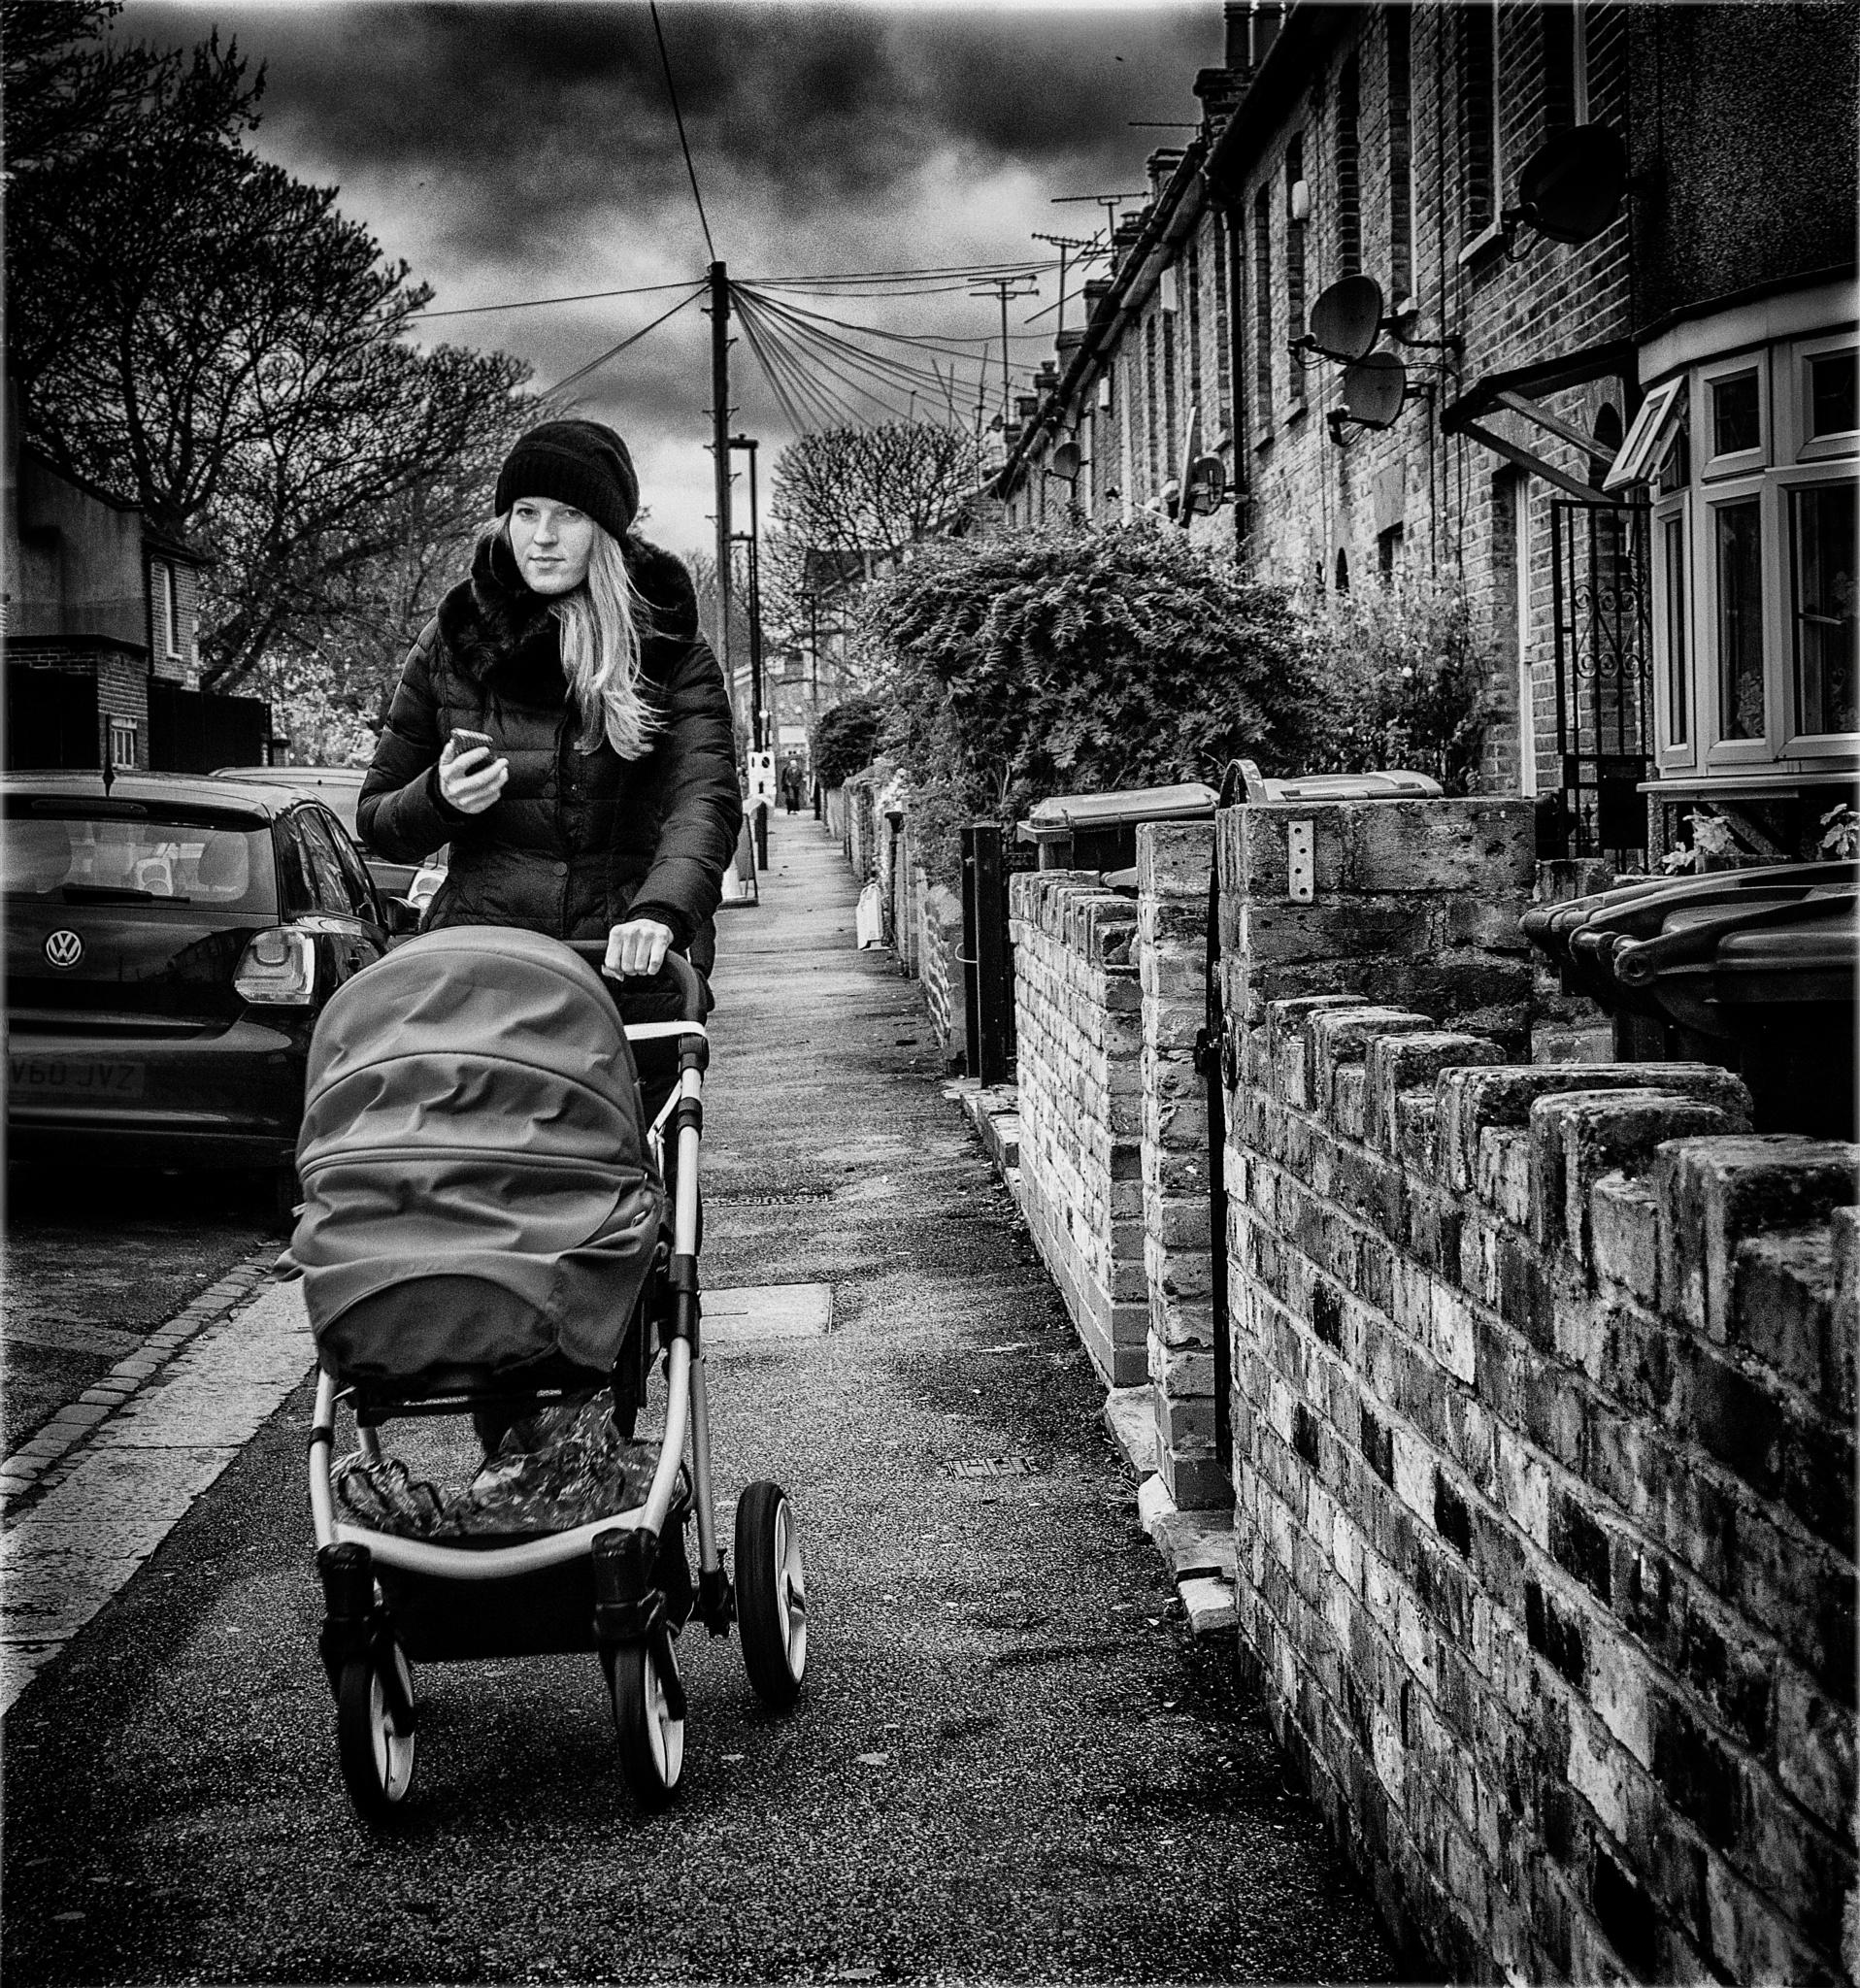 Going for a walk by Henri Mattocks